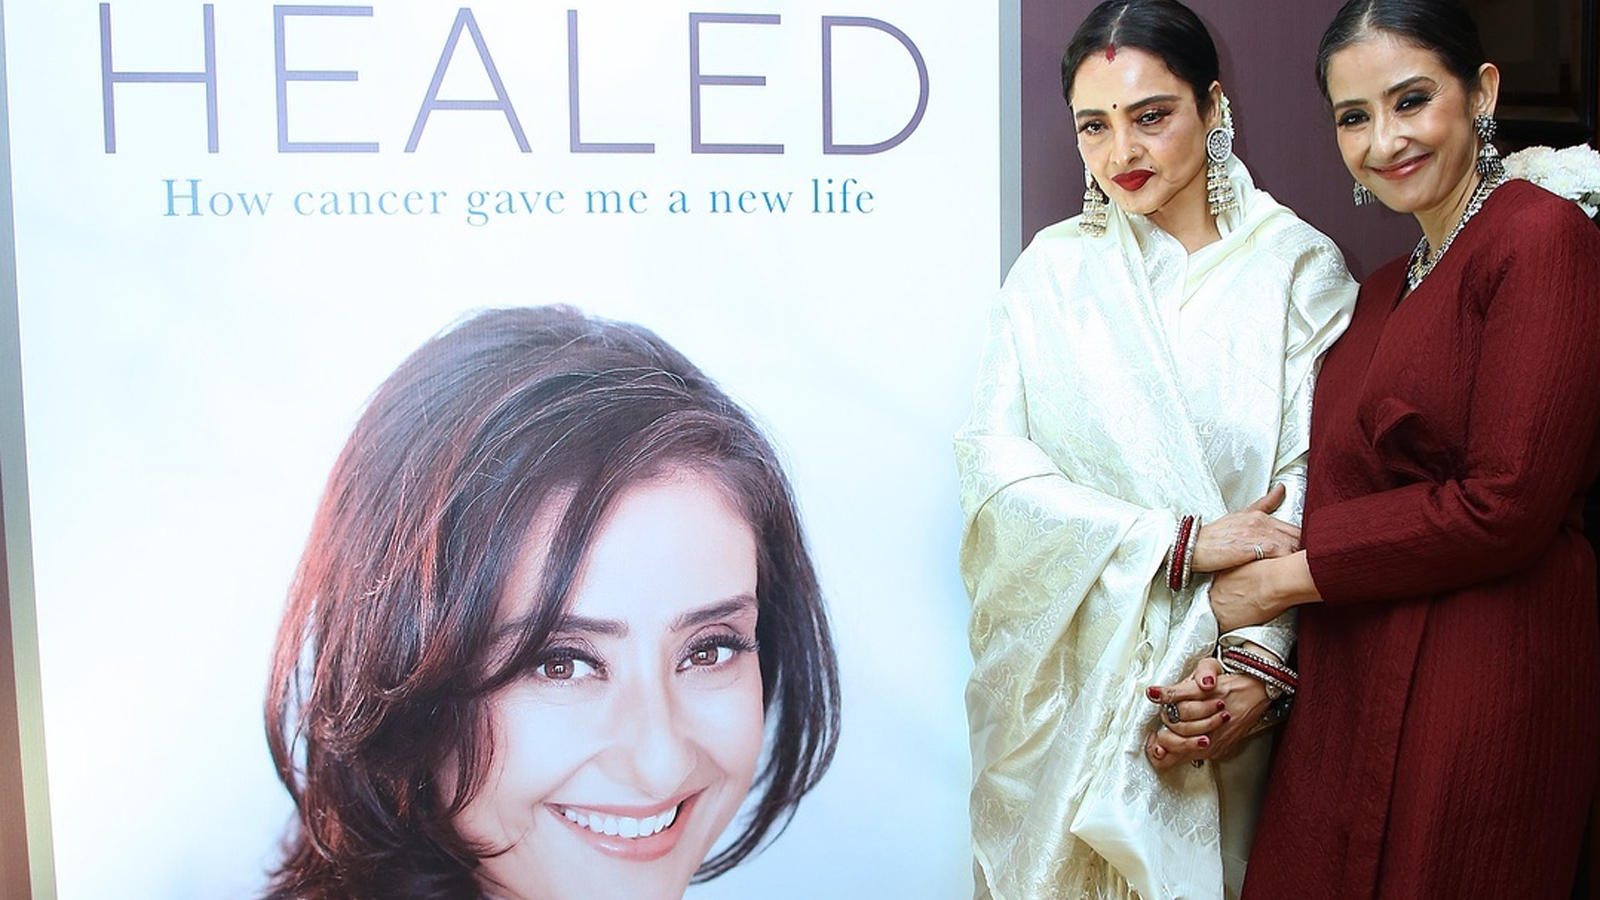 Manisha Koirala launches book on cancer titled 'Healed'